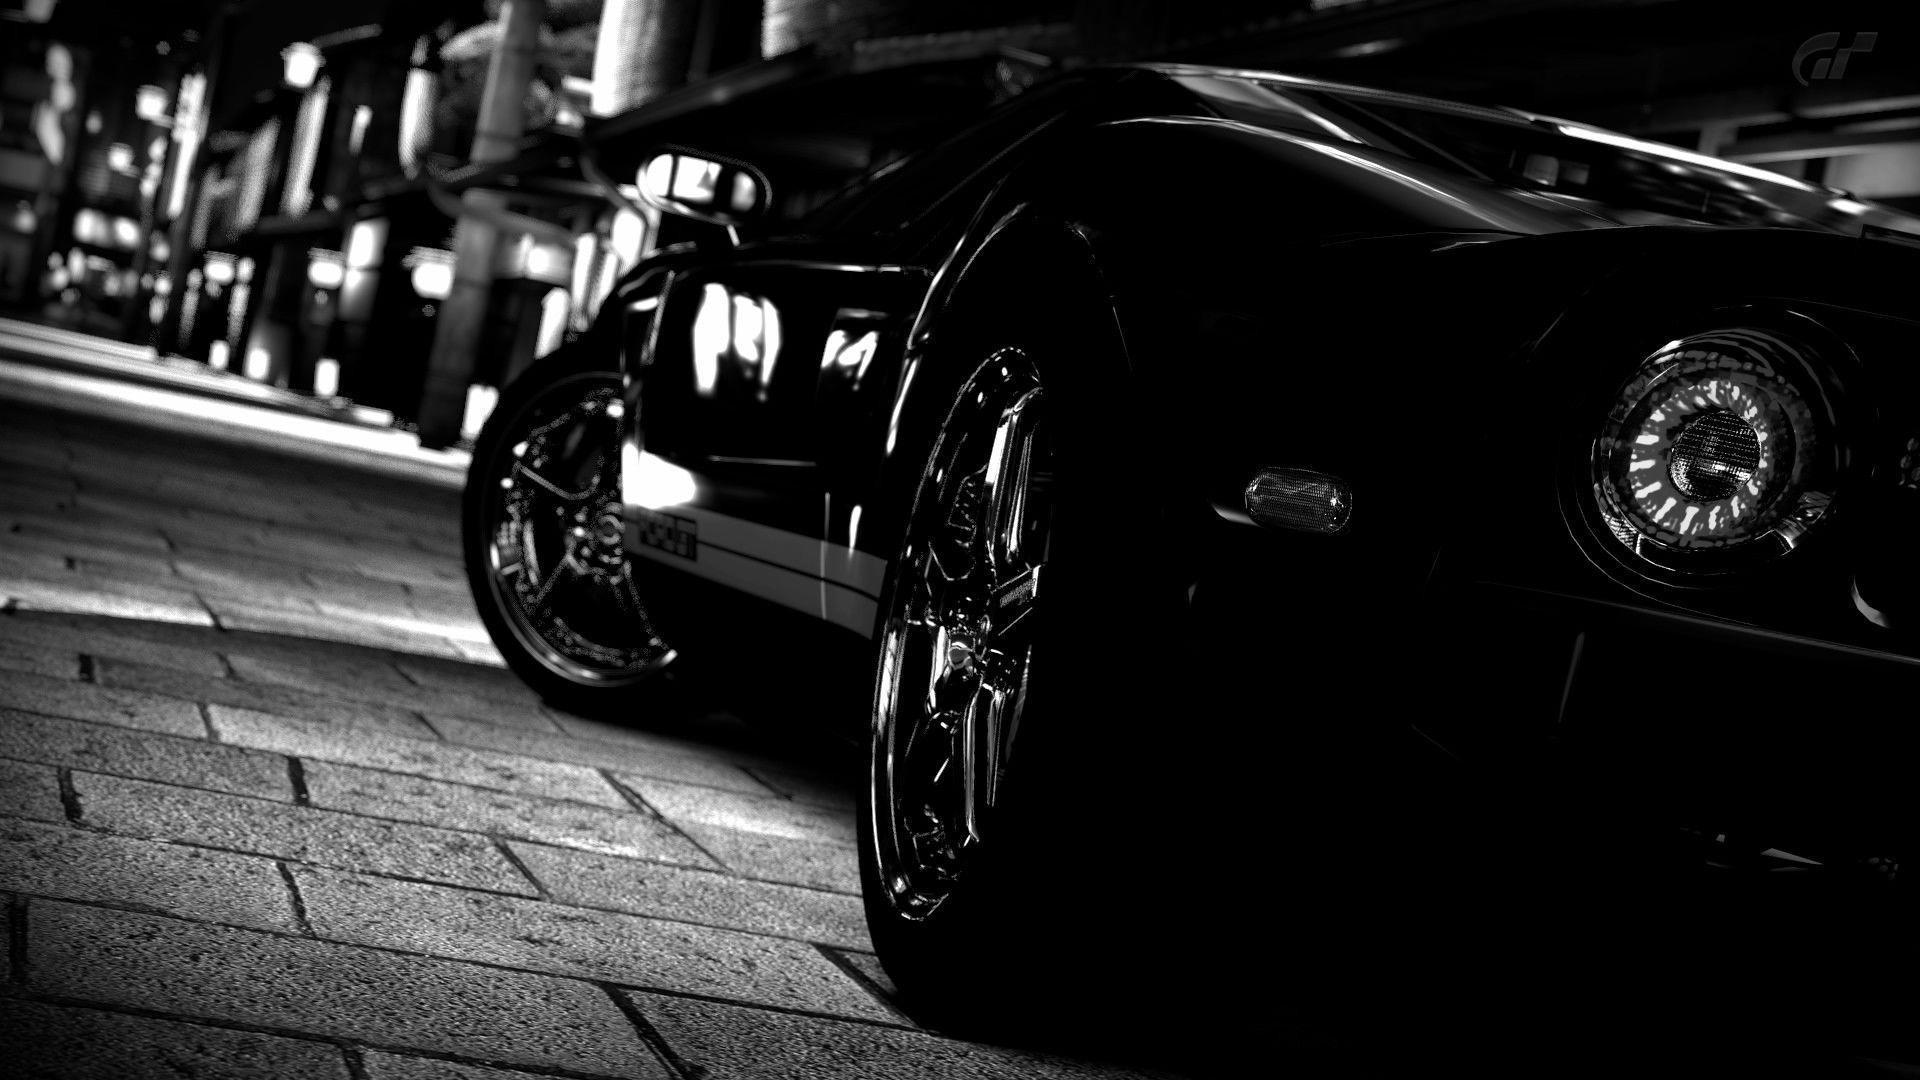 Vehicles For > Cars Wallpaper Hd For Desktop Black